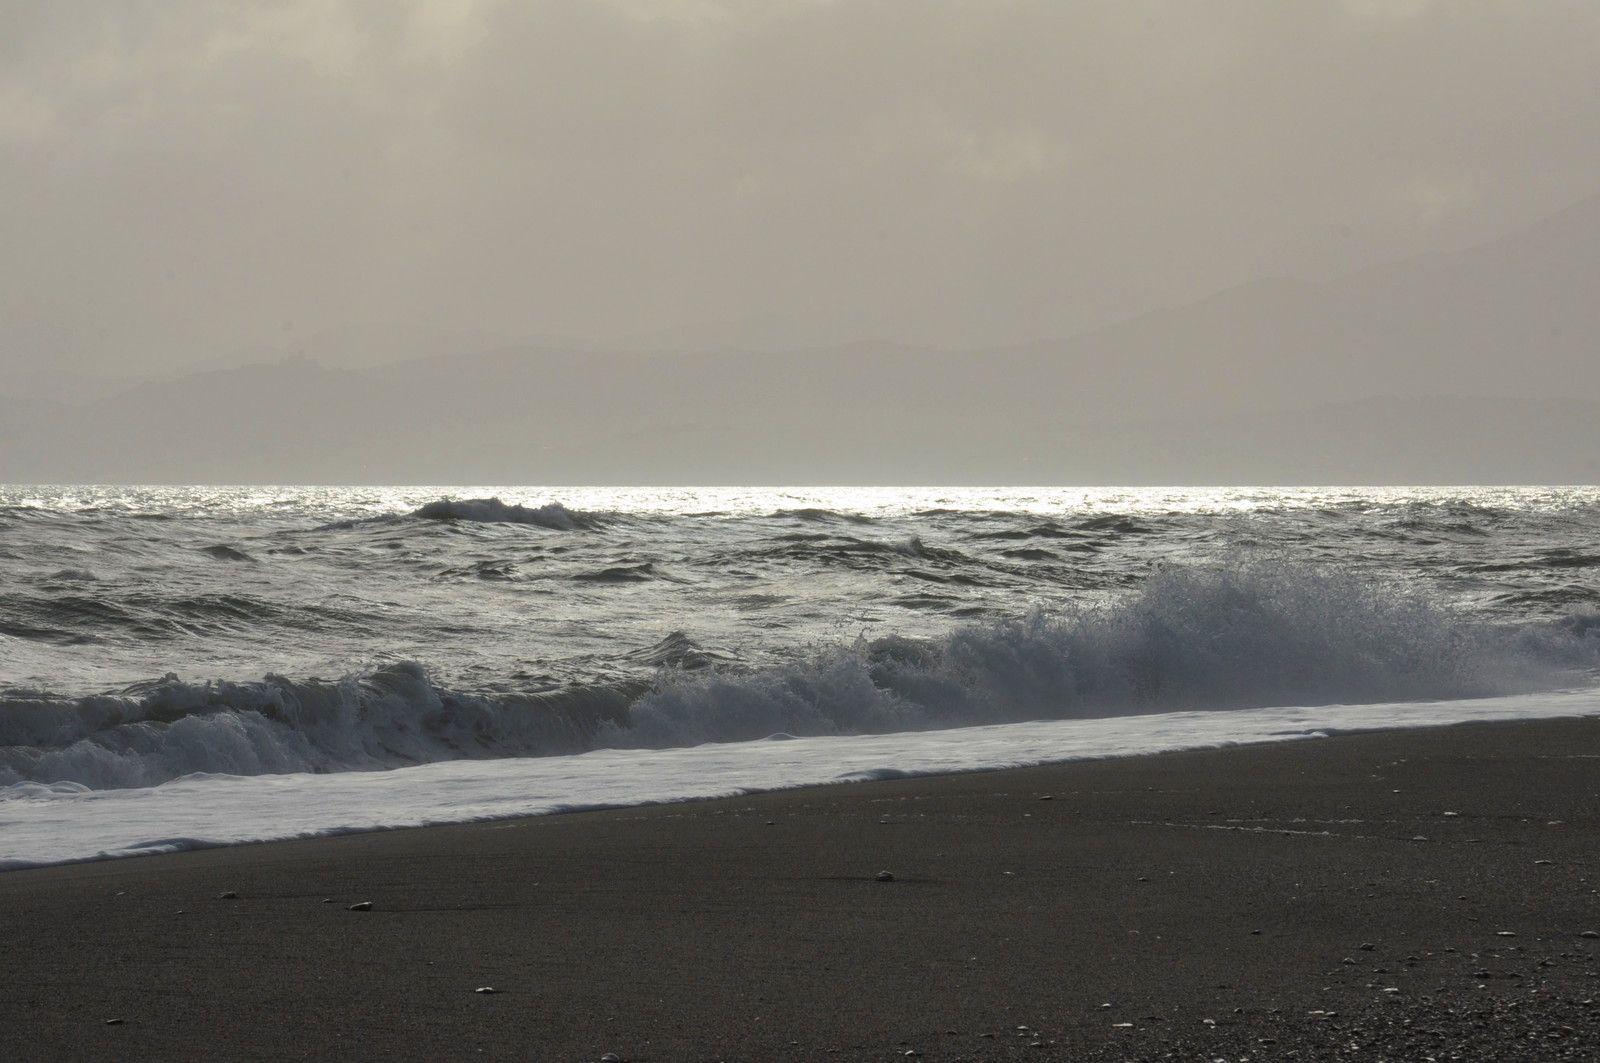 Un moment tranquille en bord de mer